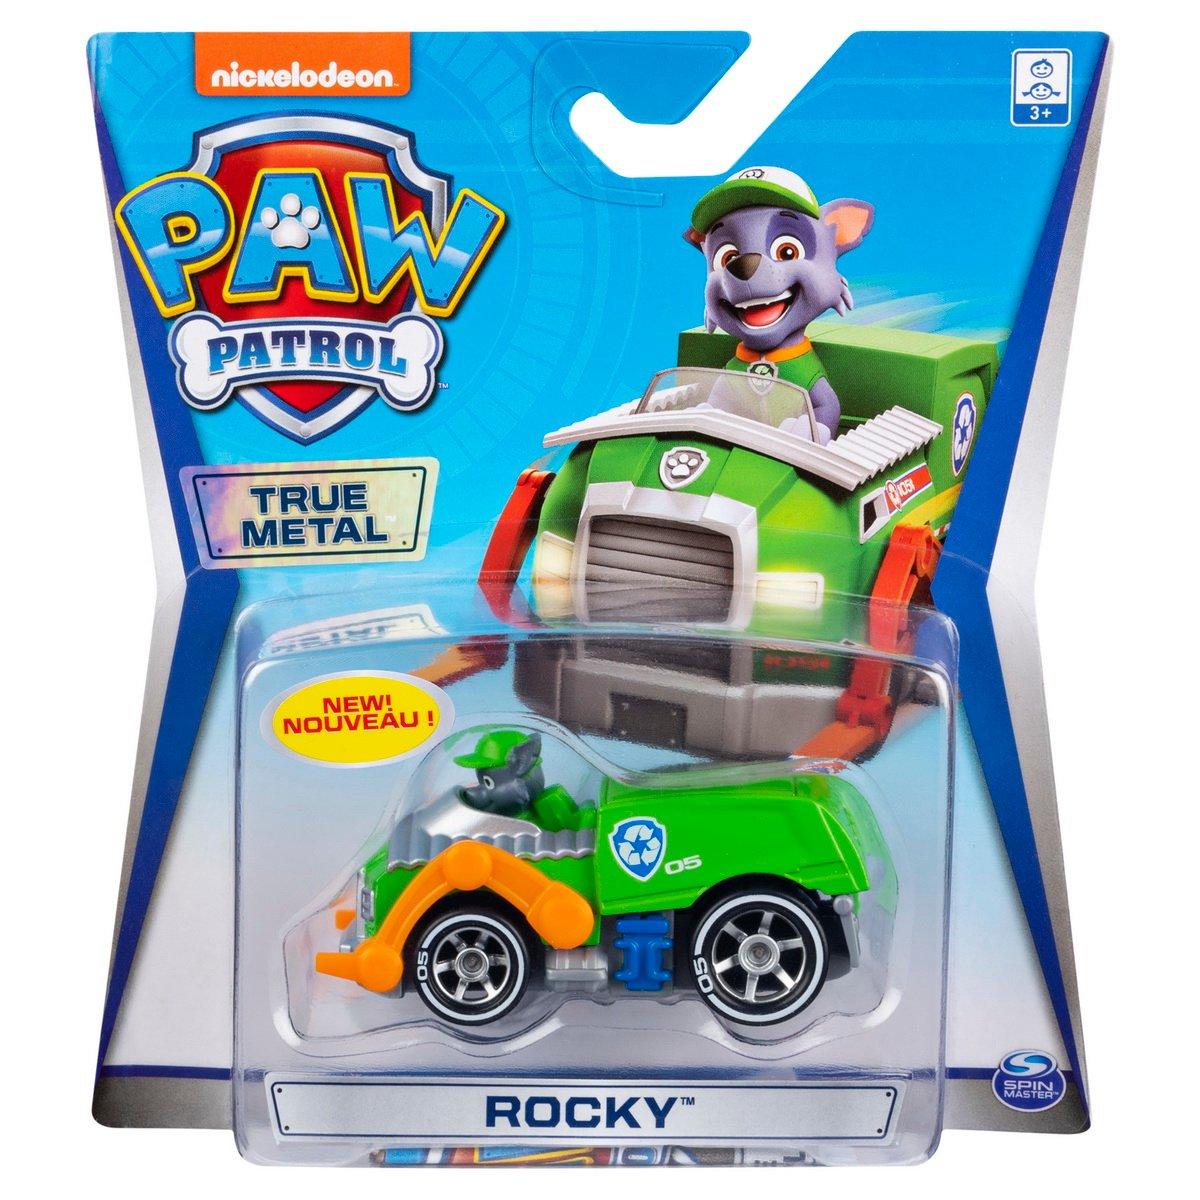 Masinuta cu figurina Paw Patrol True Metal, Rocky, 20127213